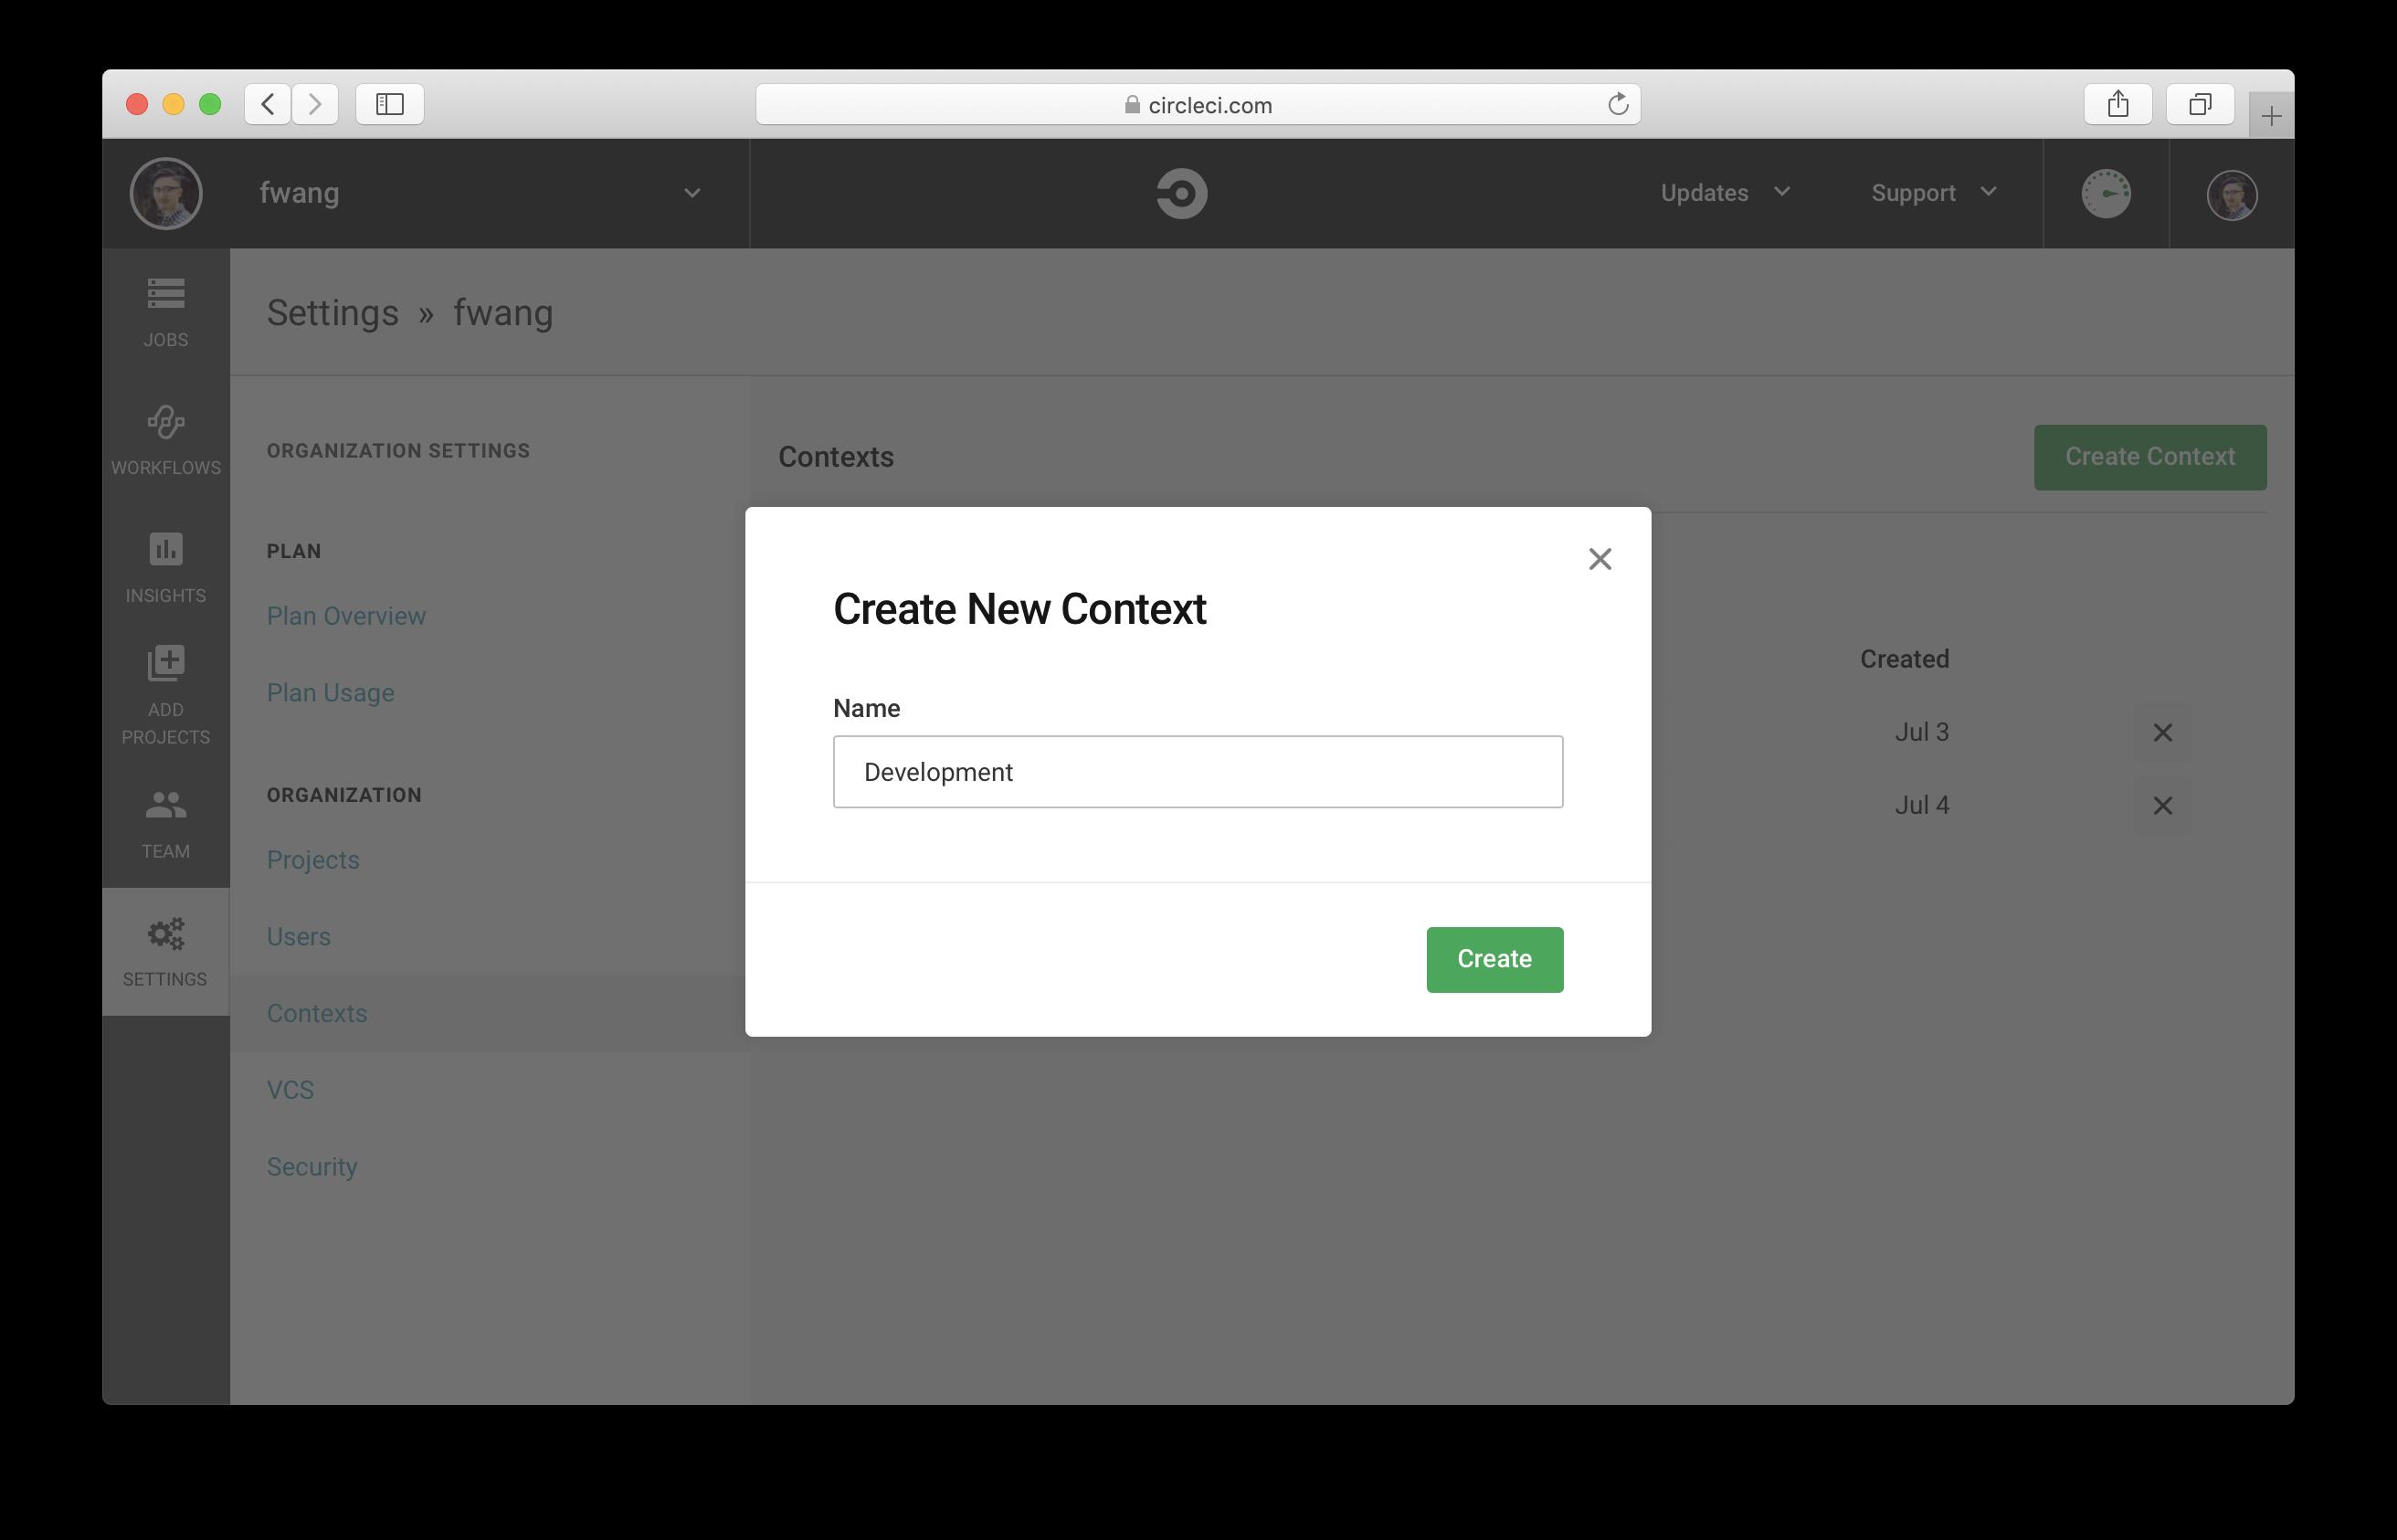 Create CircleCI Context called Development